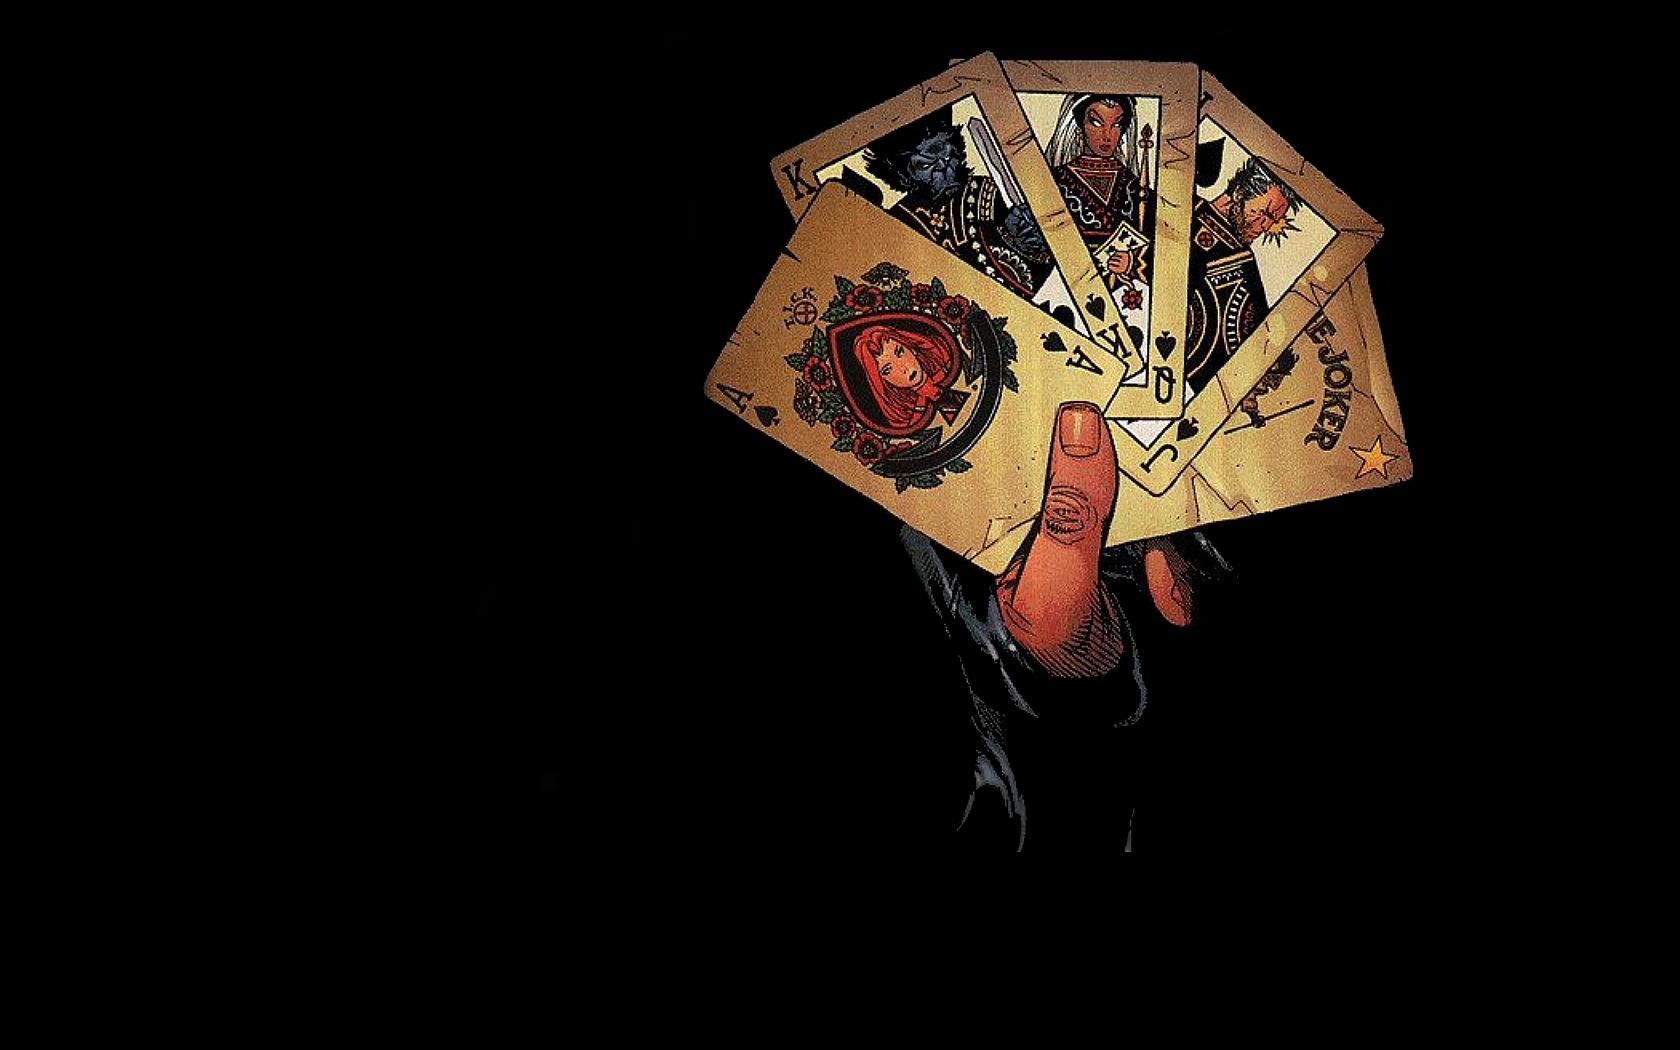 X-Men Origins: Wolverine images Gambit HD wallpaper and background ...